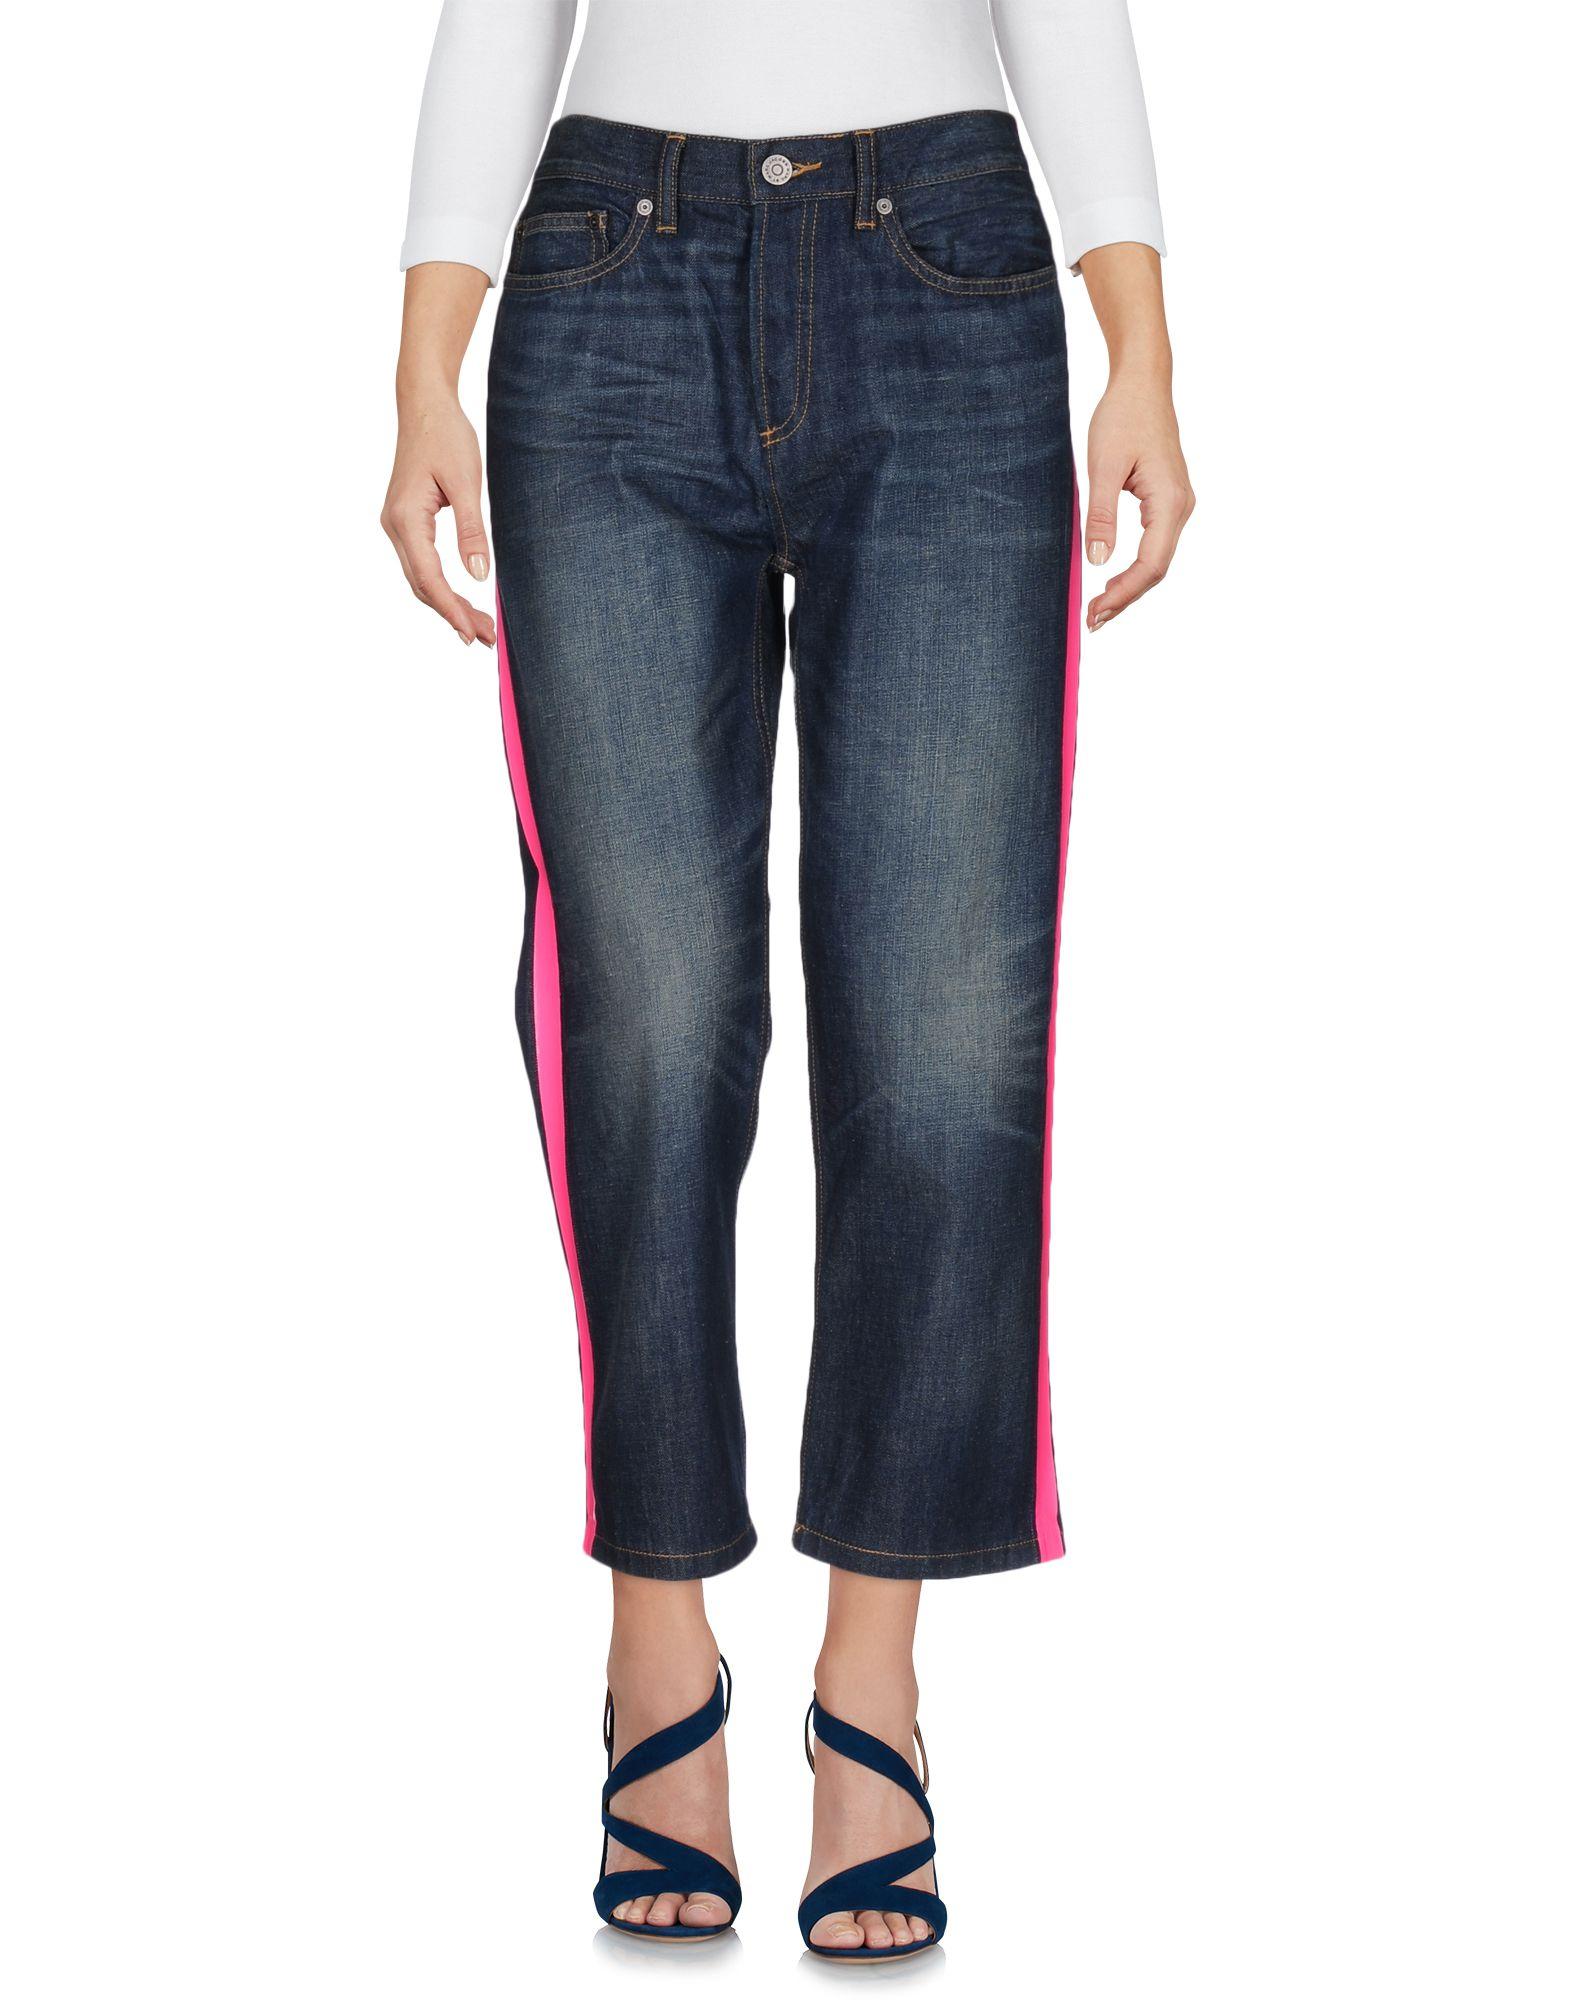 MARC BY MARC JACOBS Джинсовые брюки-капри